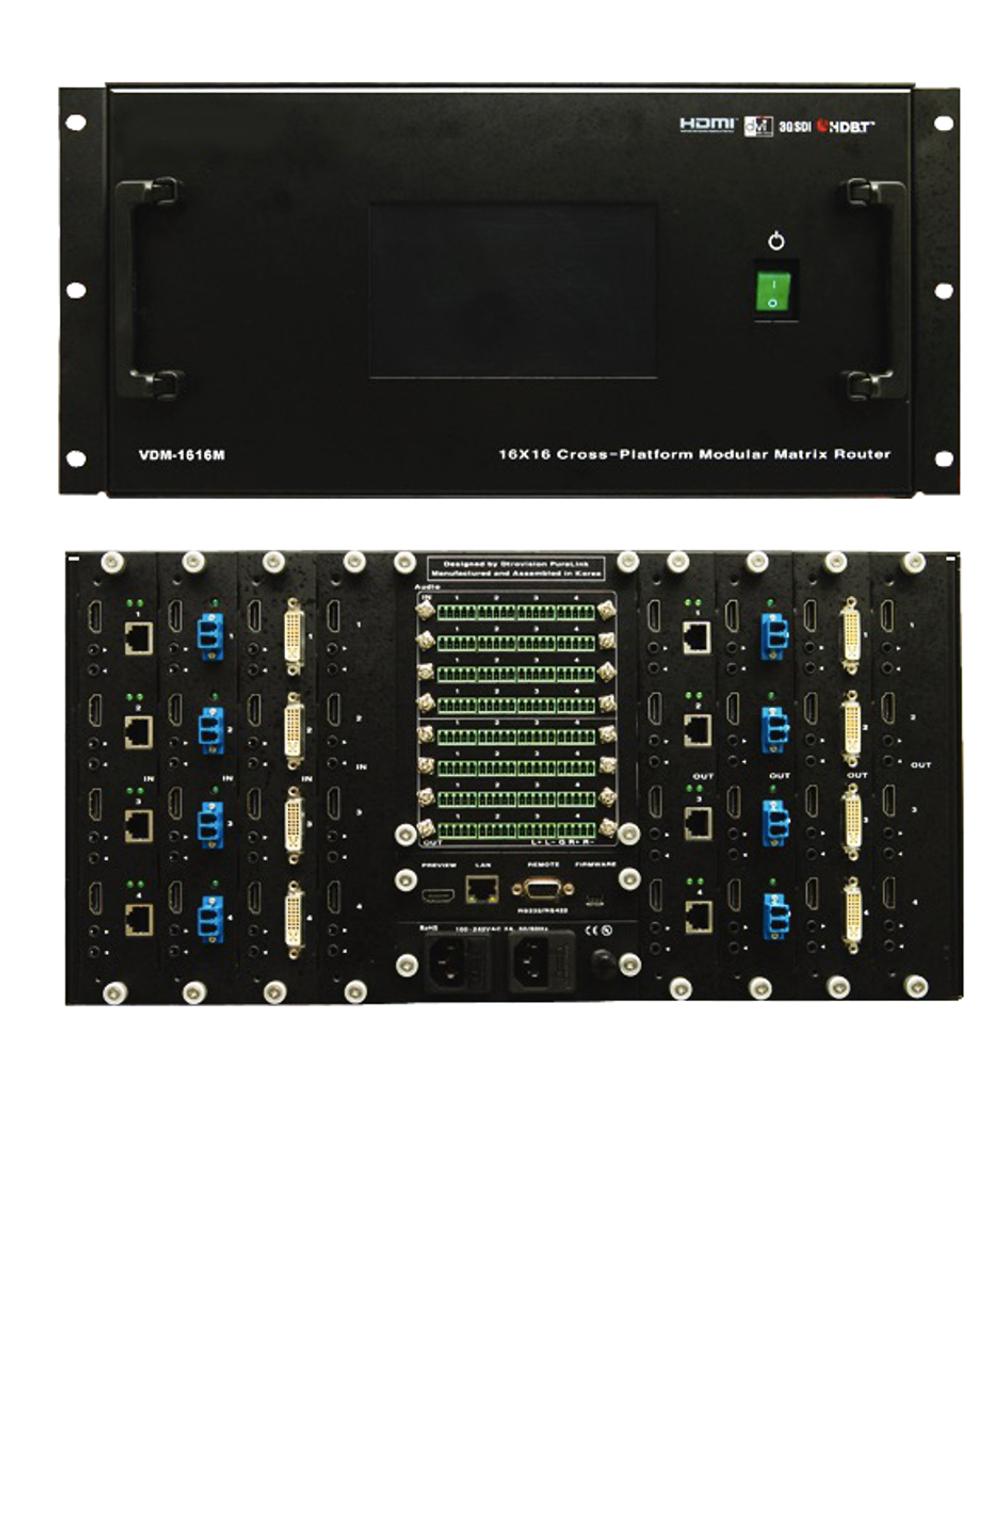 Modular Matrix Router